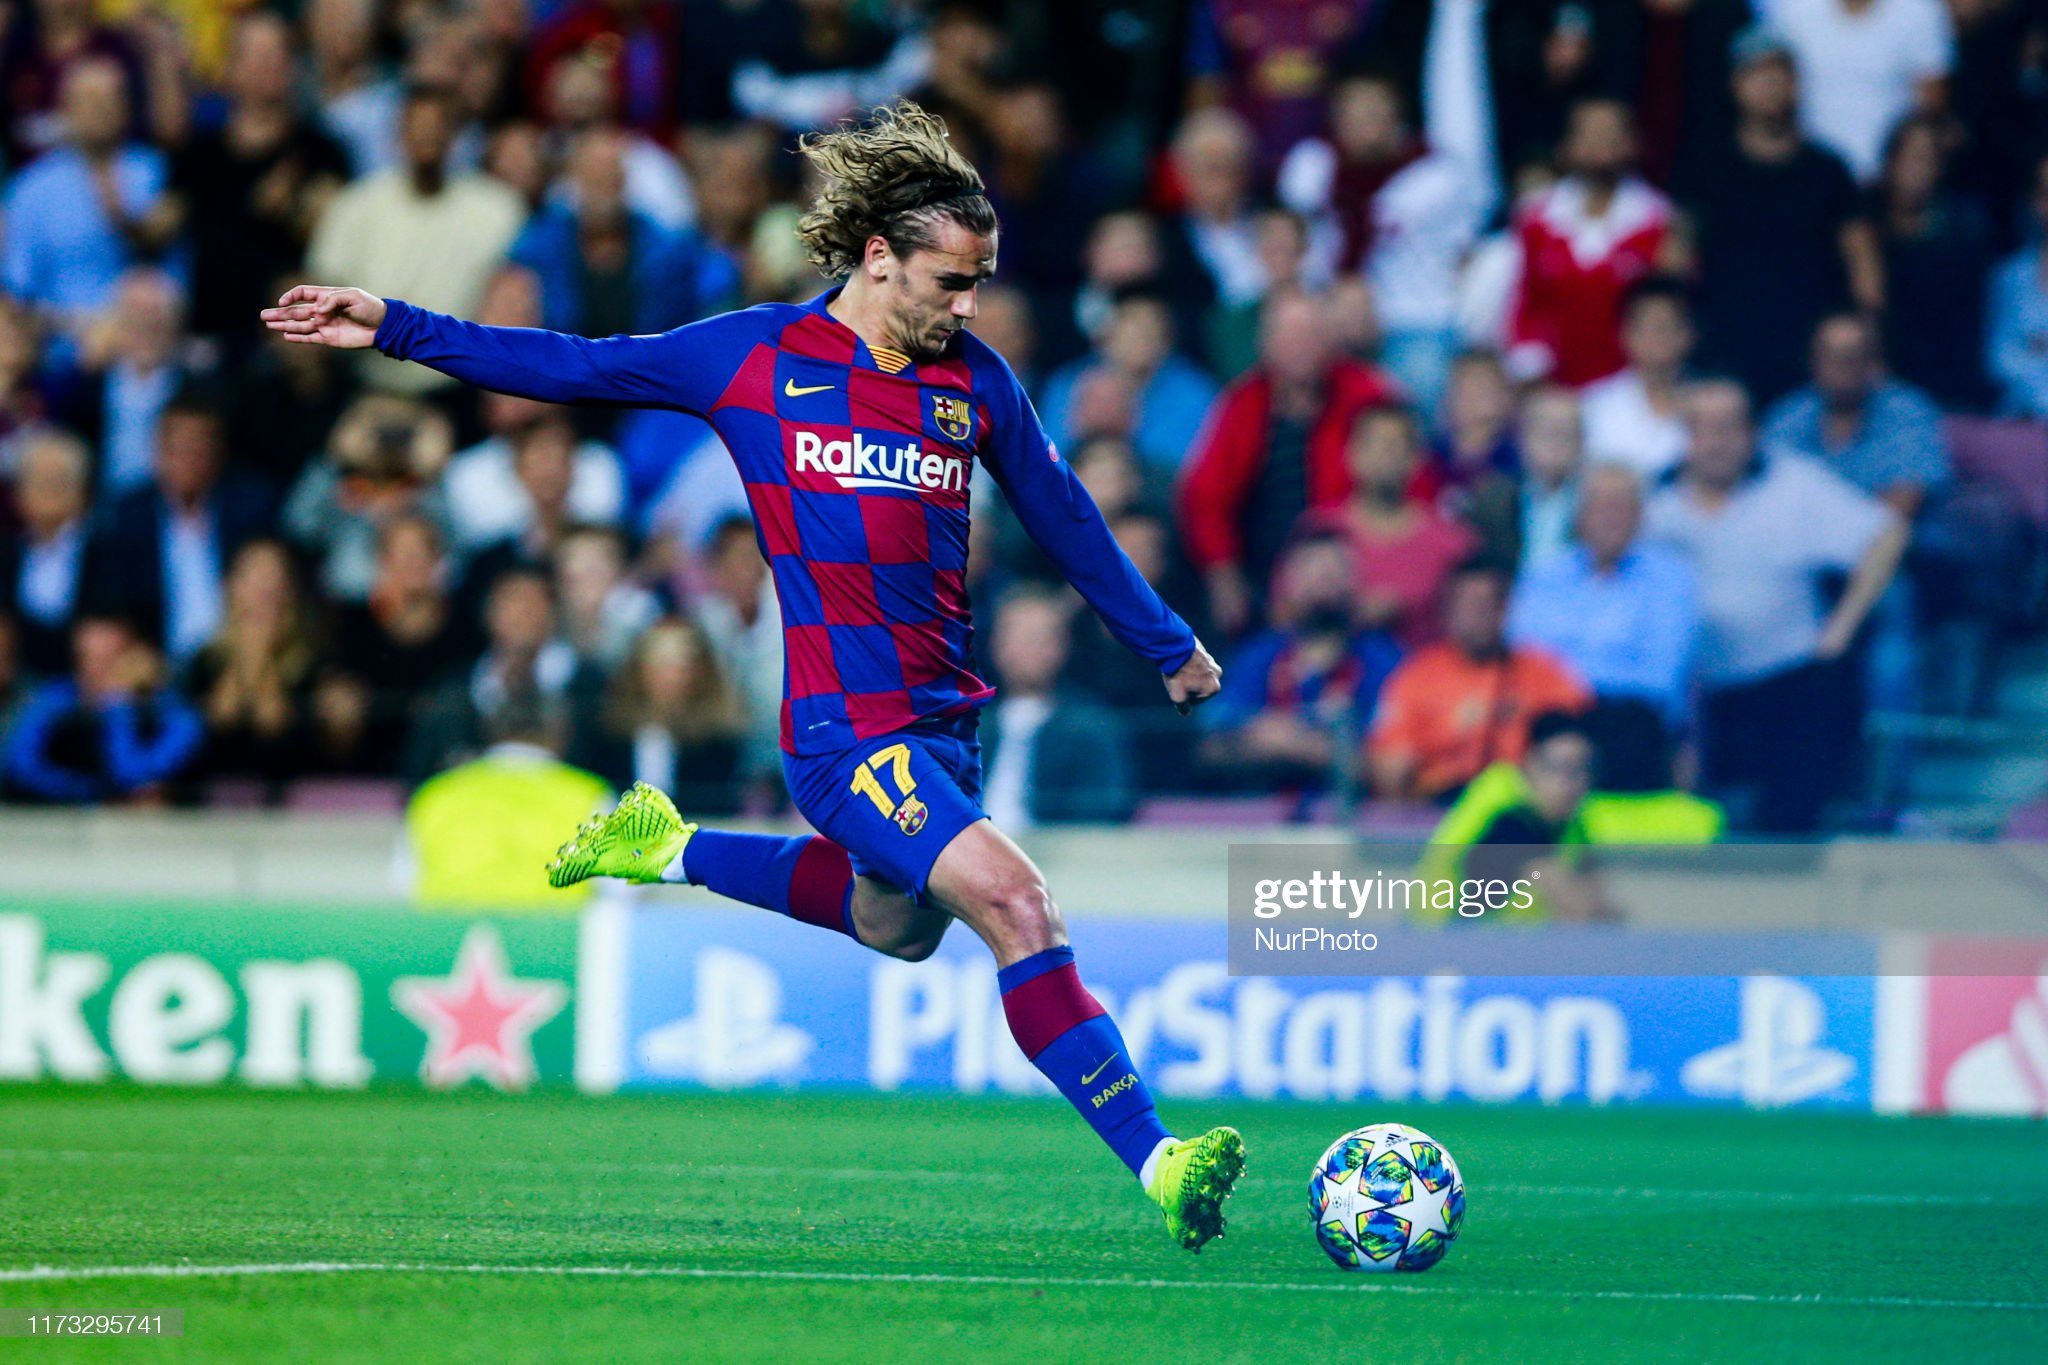 صور مباراة : برشلونة - إنتر 2-1 ( 02-10-2019 )  Antoine-griezmann-from-france-of-fc-barcelona-during-the-uefa-league-picture-id1173295741?s=2048x2048